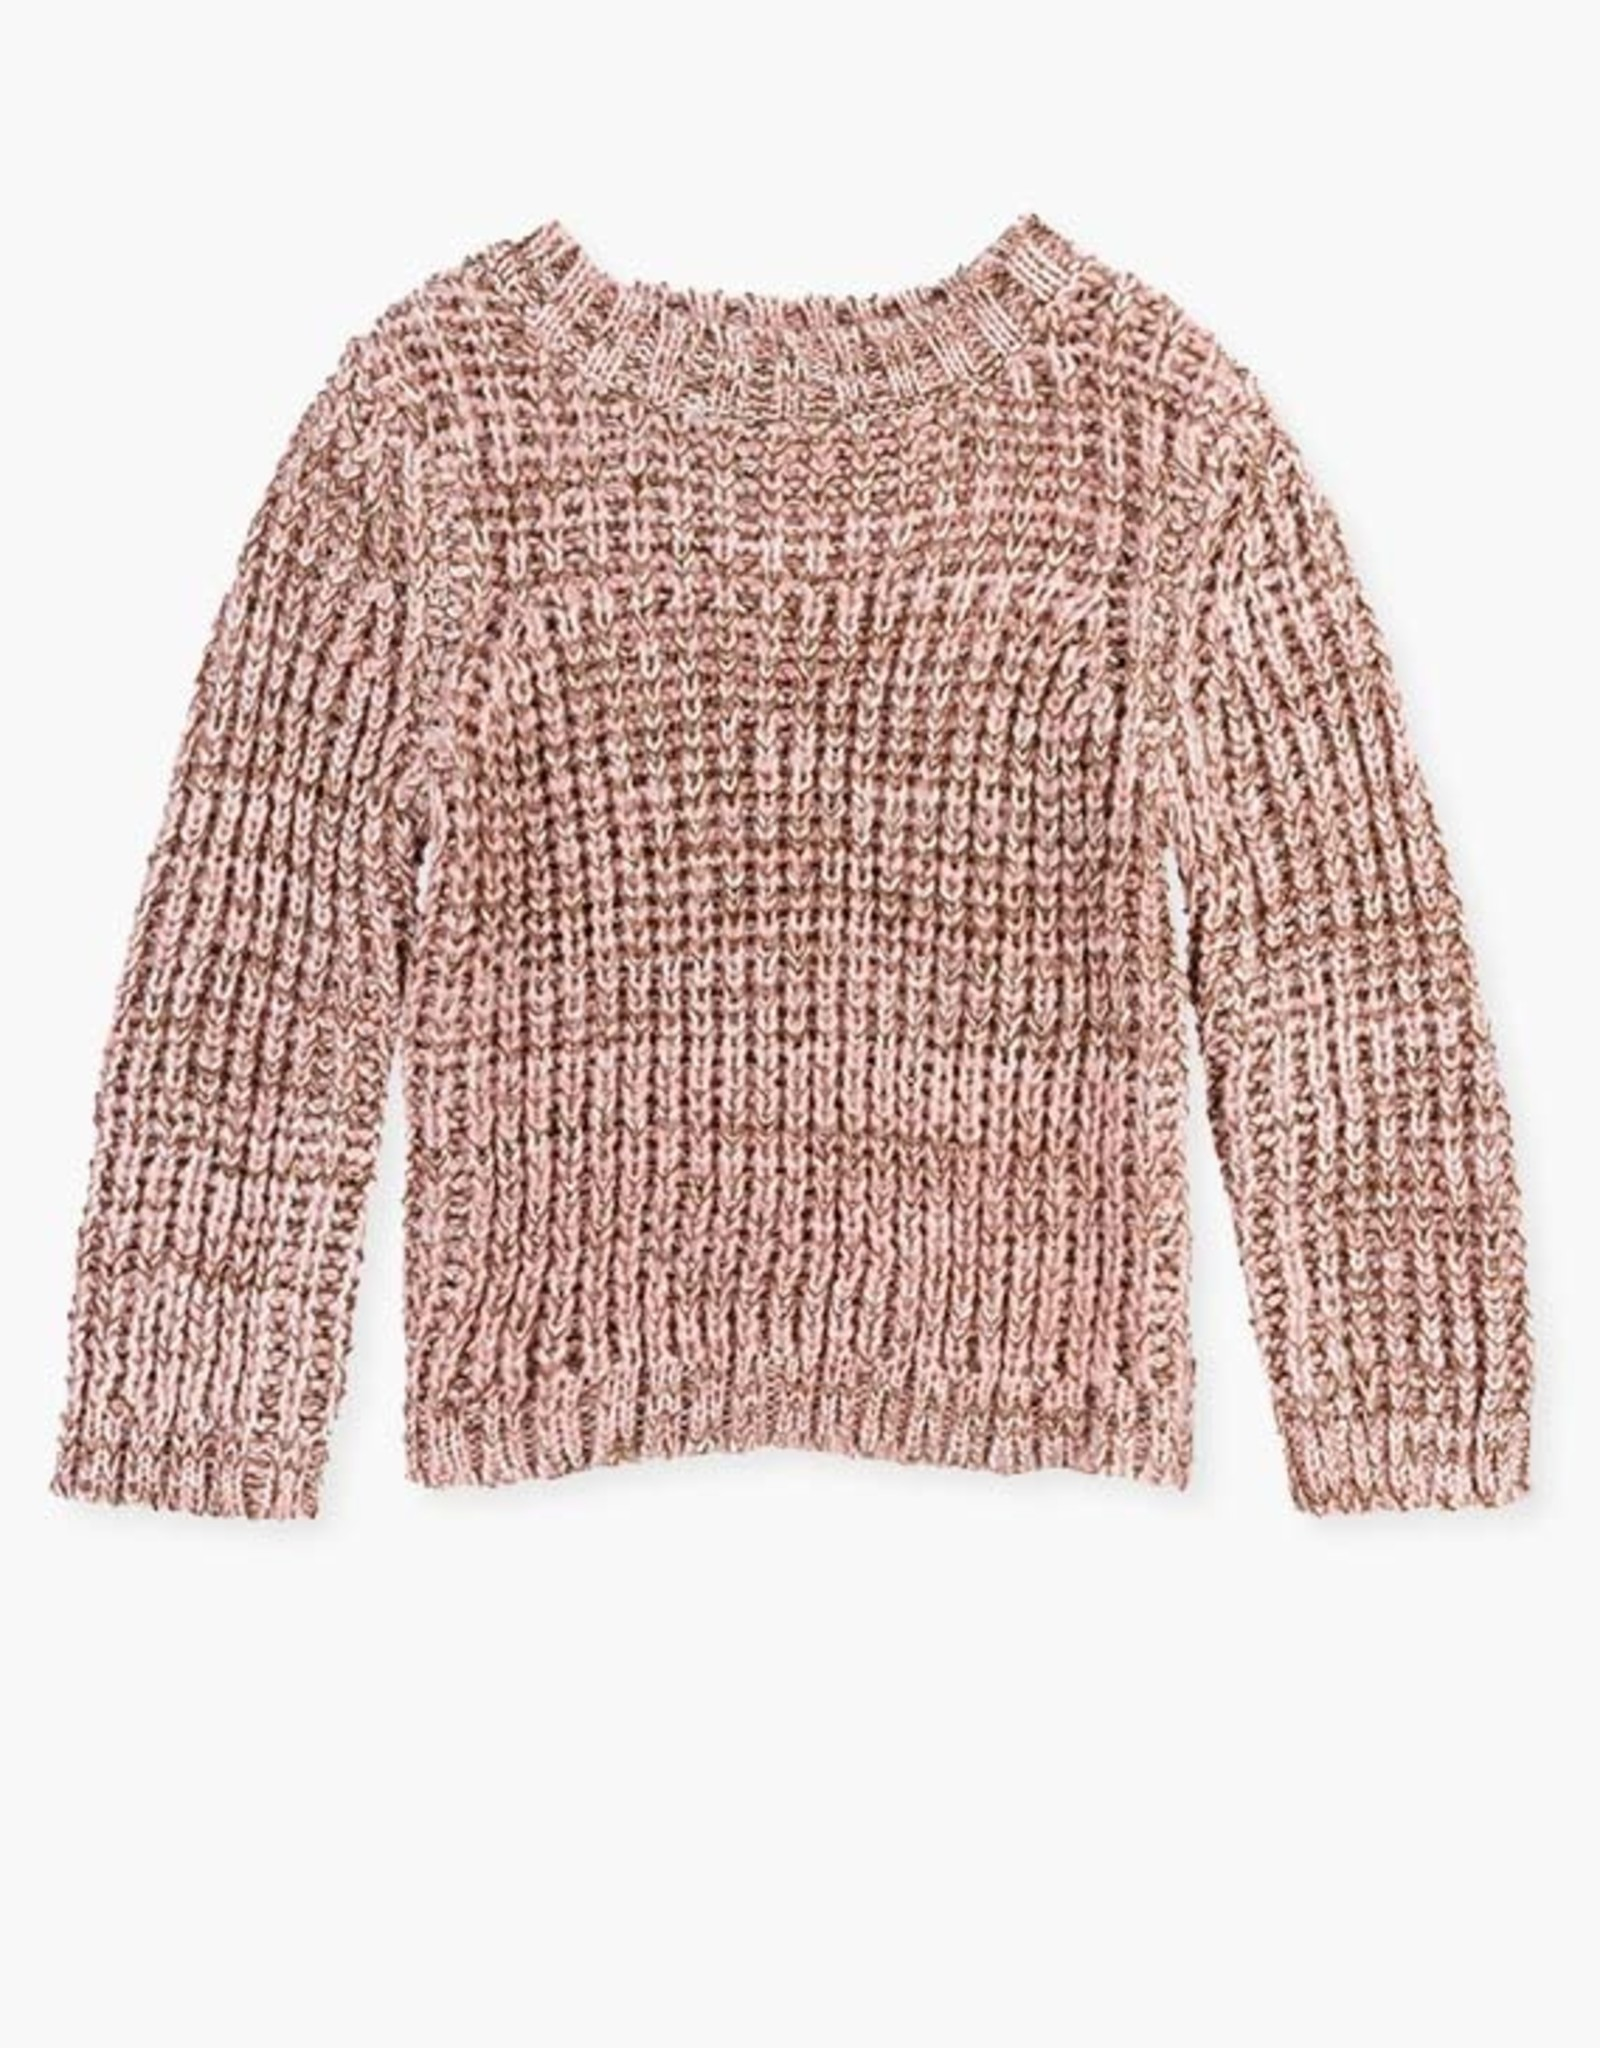 Losan FA20  Knit sweater - pink sparkle